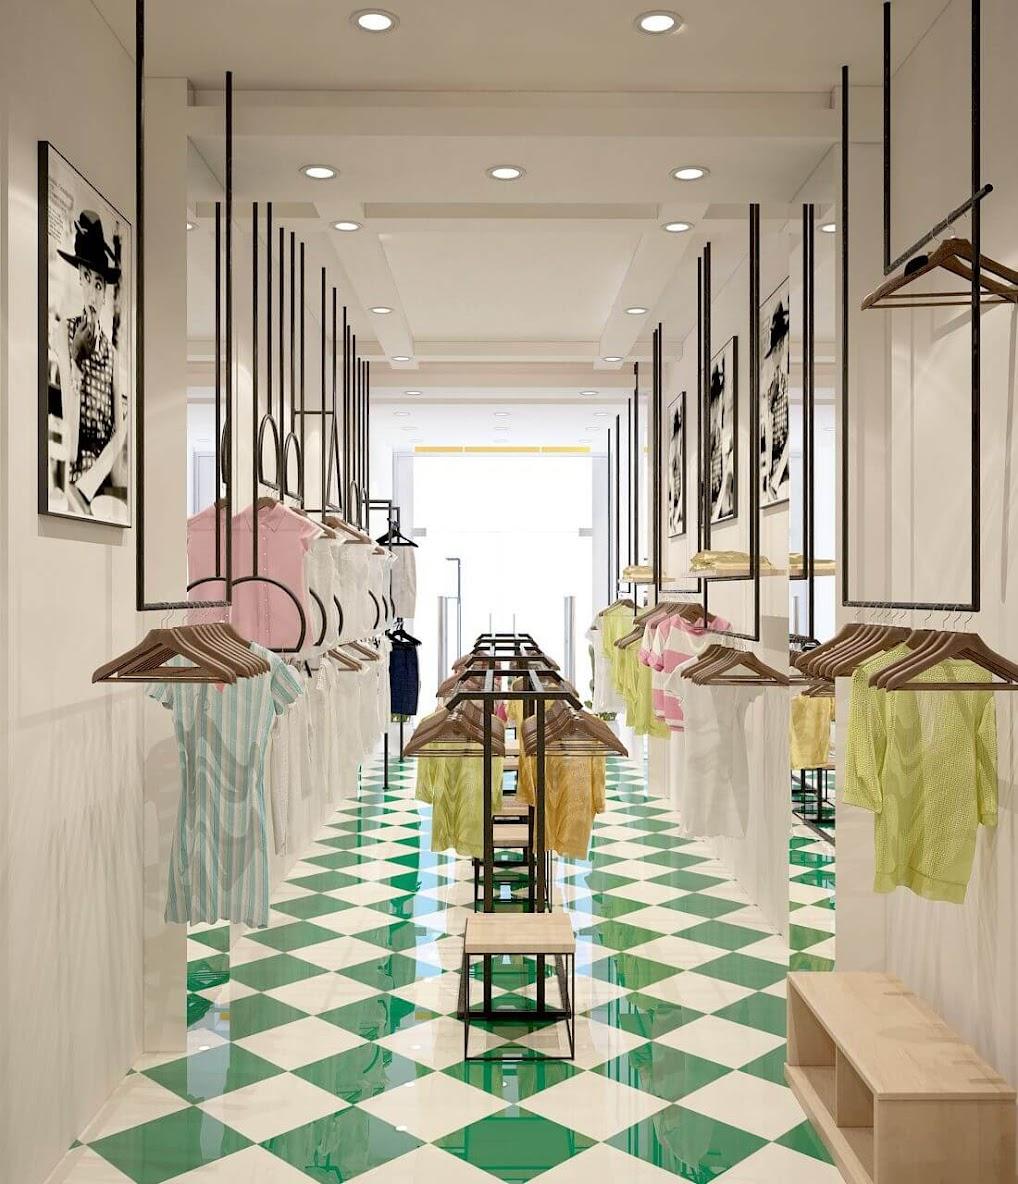 Thiết kế cửa hàng thời trang Hanosimex